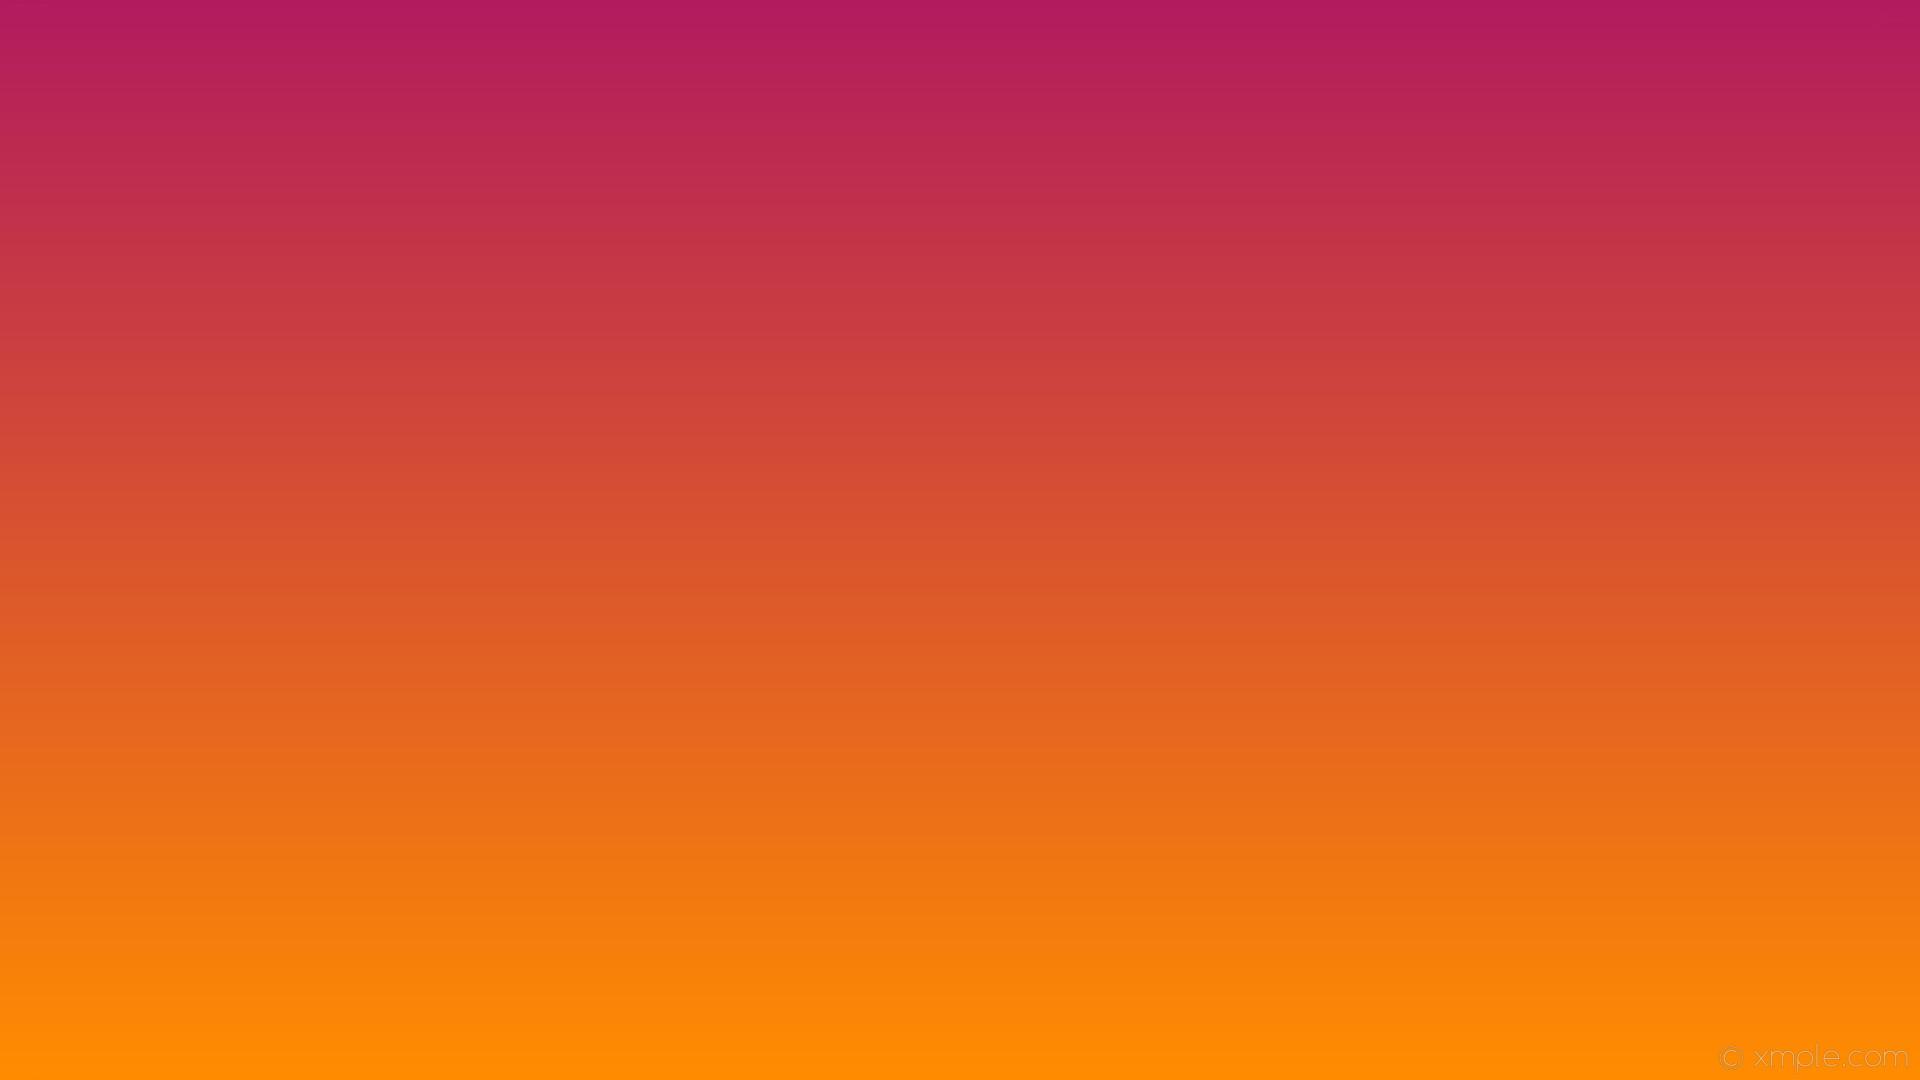 wallpaper gradient linear orange pink dark orange #b21b5e #ff8c00 90°